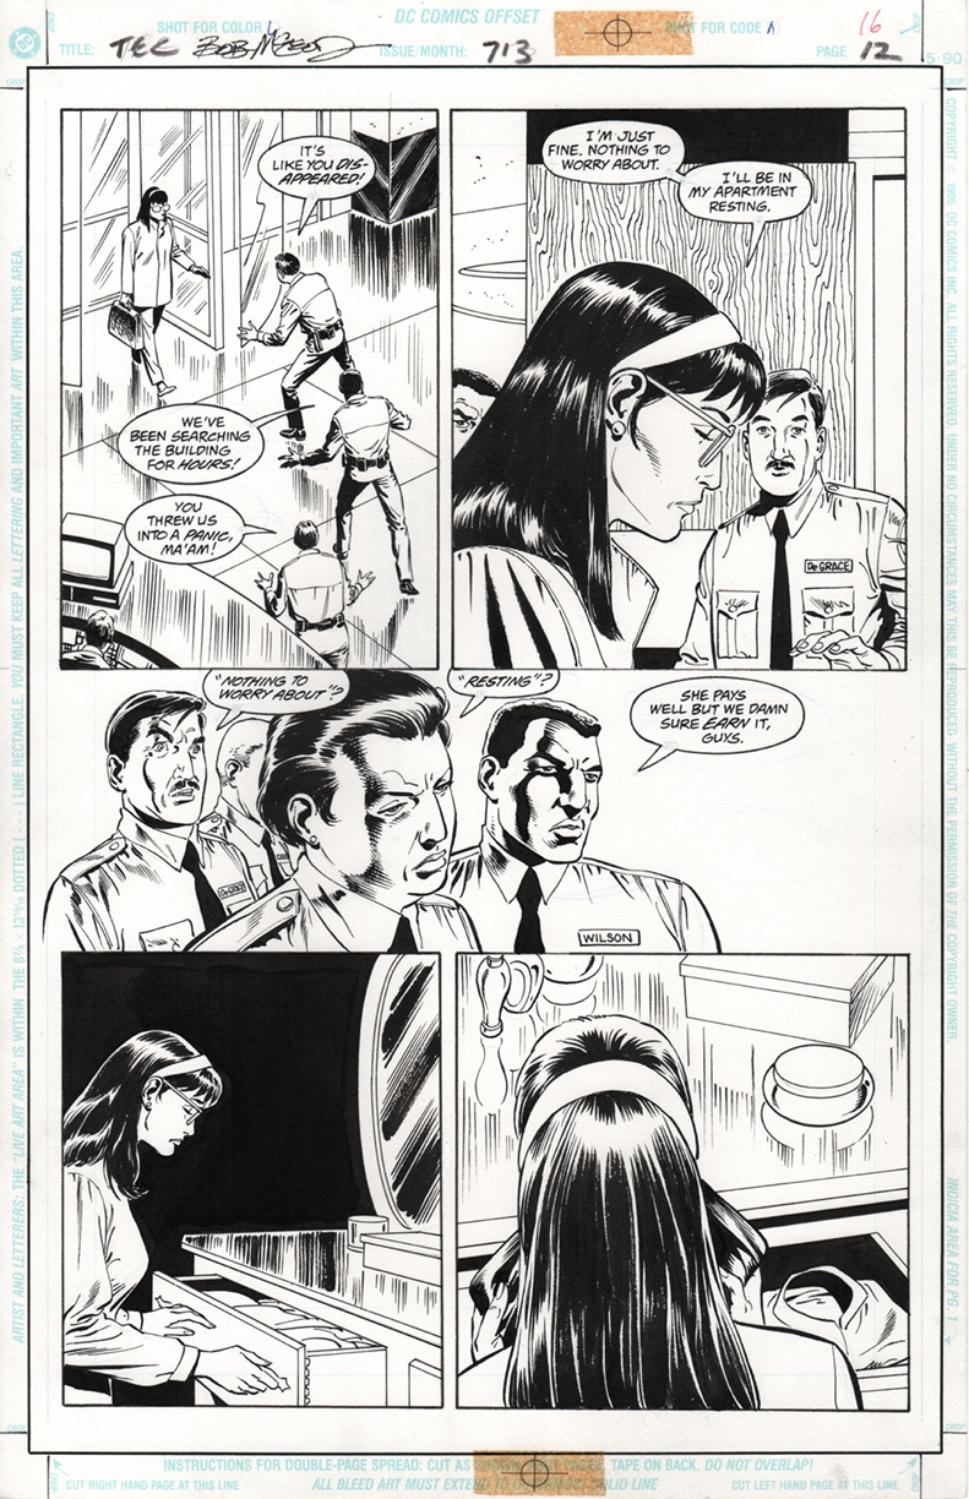 Original Art Page - Detective Comics - 713 pg12